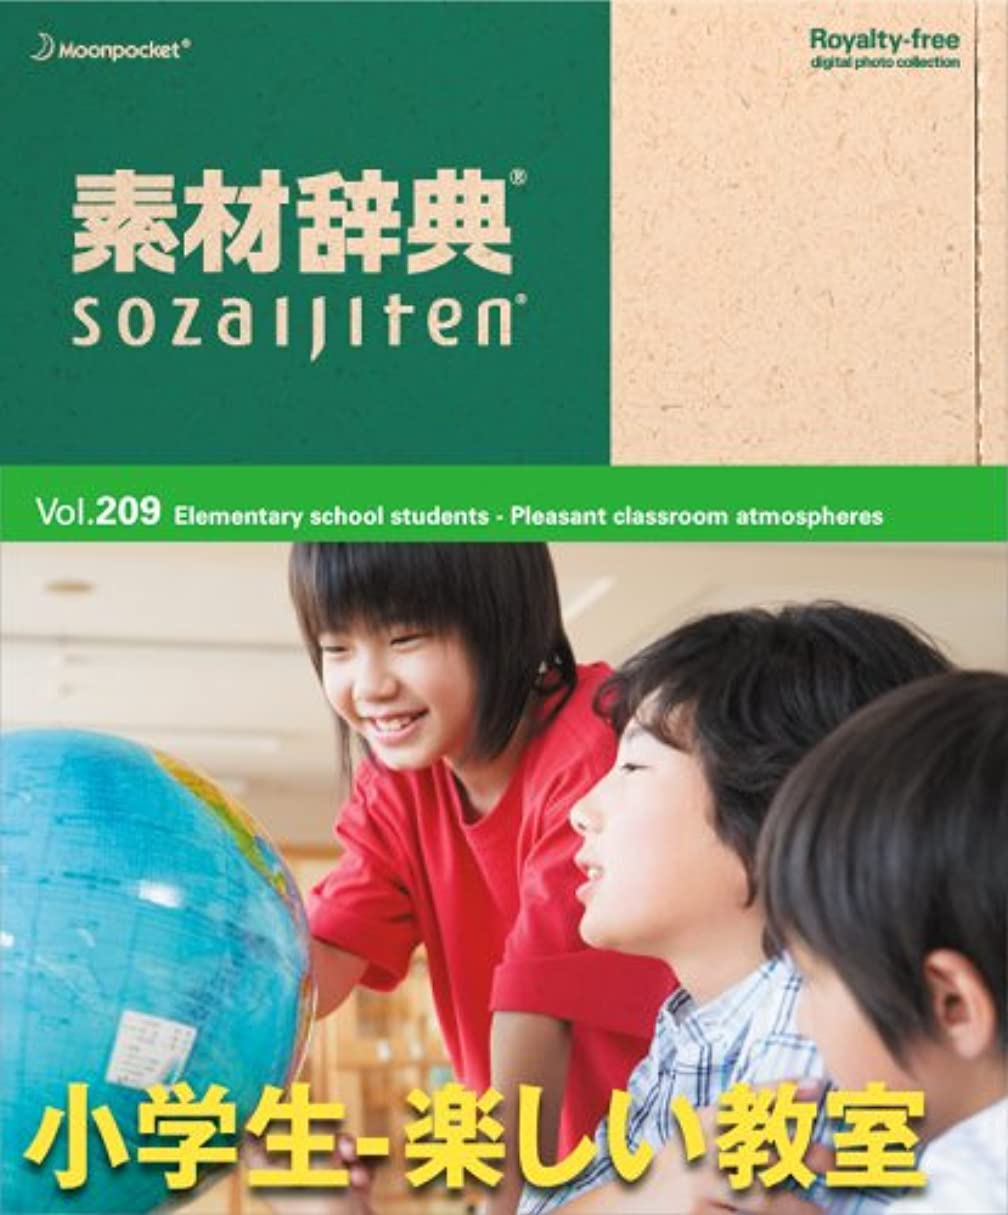 素材辞典 Vol.209 小学生-楽しい教室編